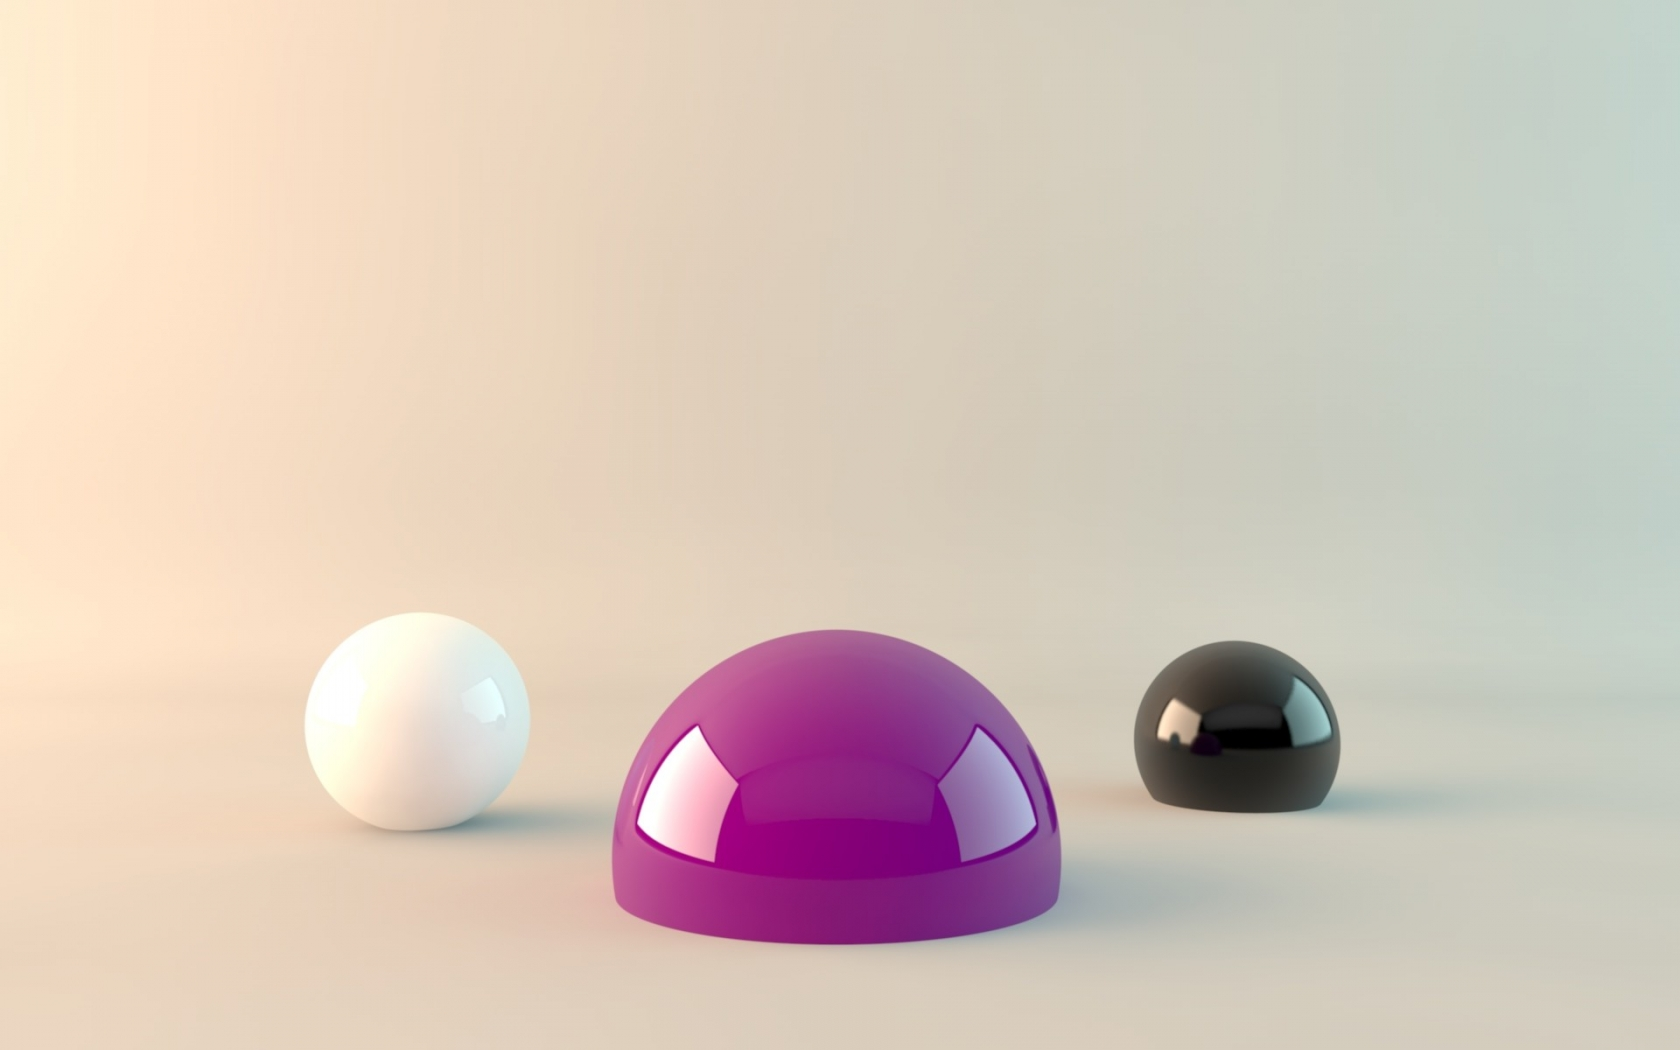 Abstracto objetos - 1680x1050